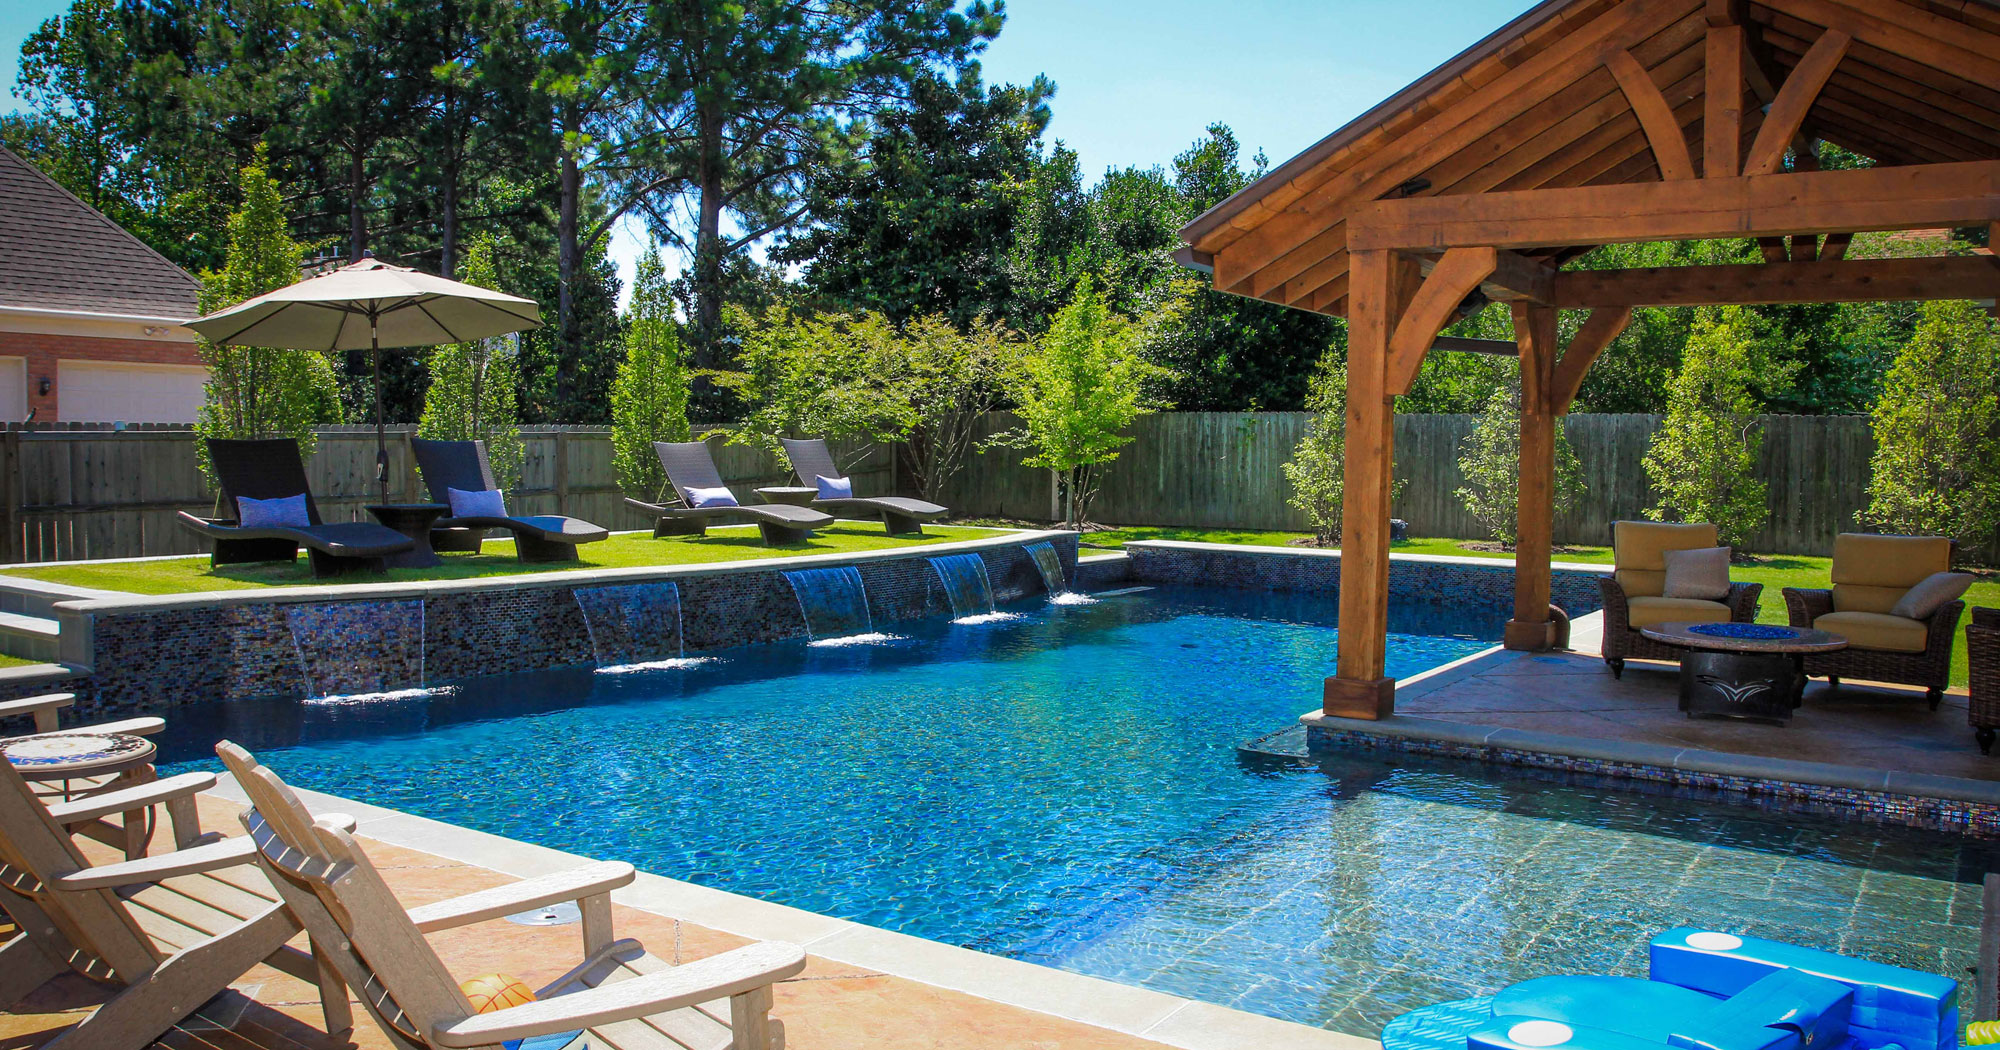 Backyard pool ideas  93